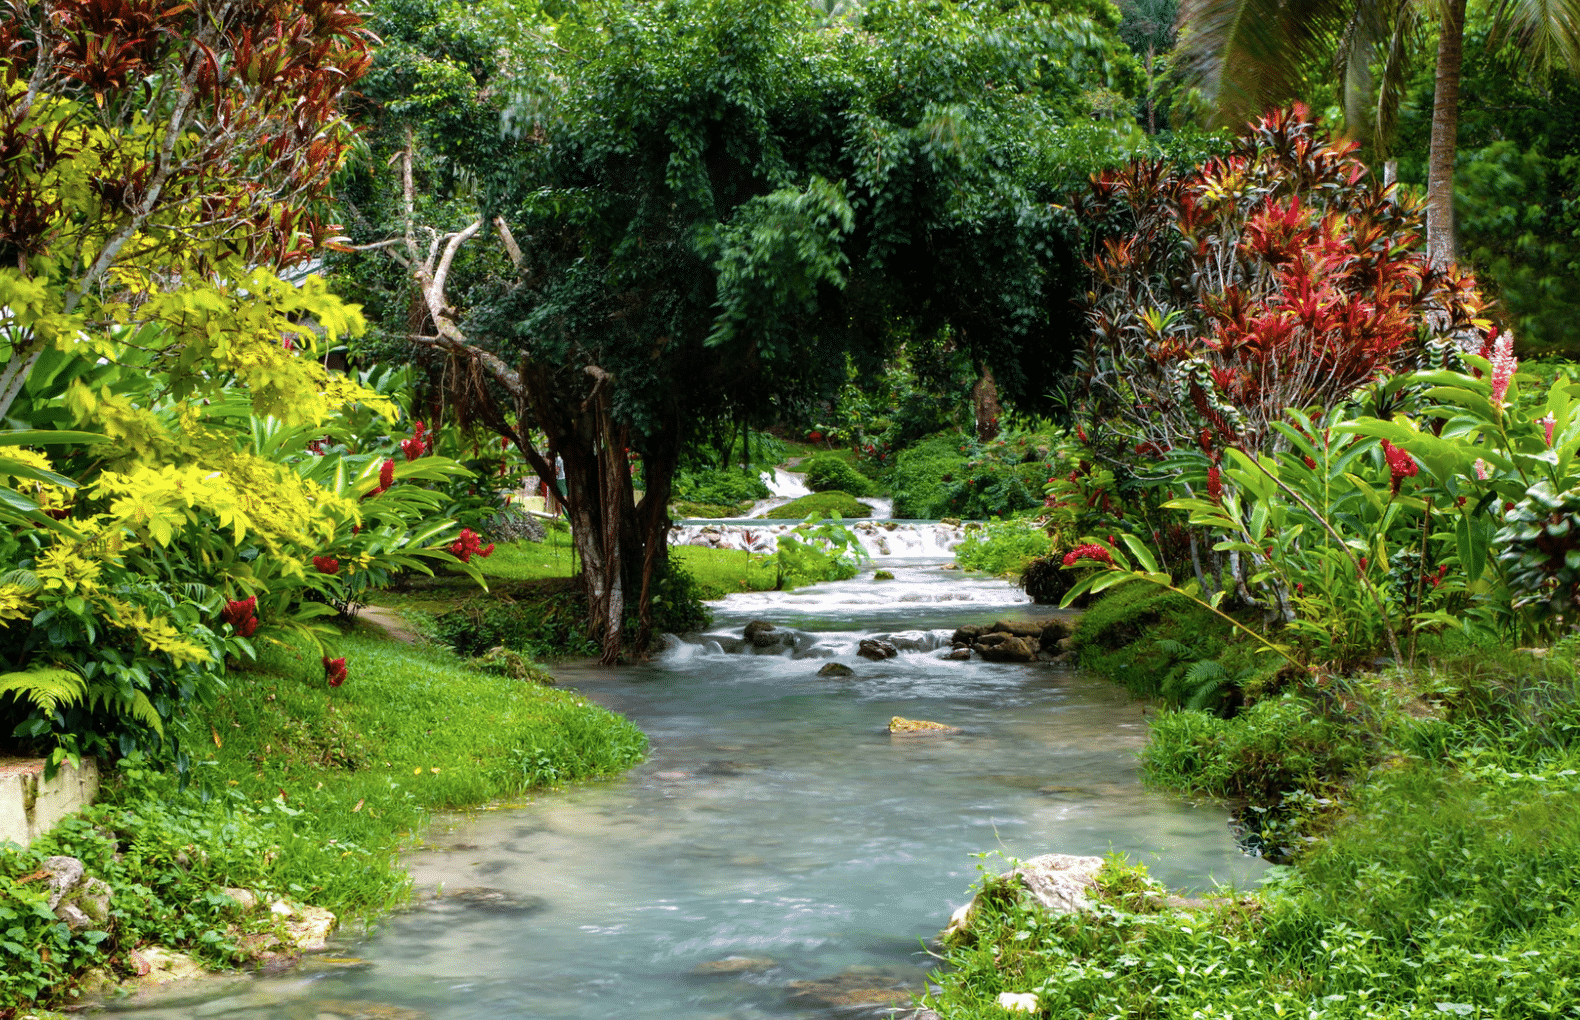 Things to do in Vanuatu